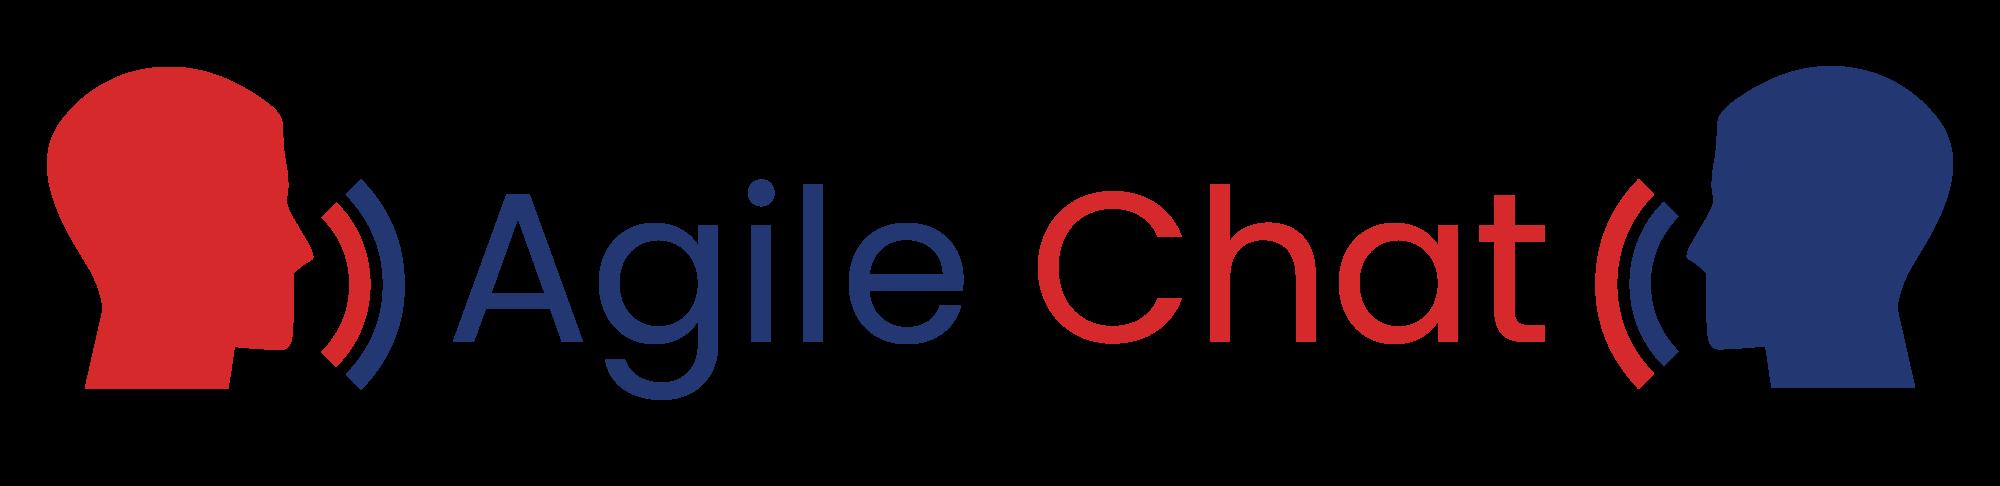 Agile-Chat-LogoL-Standard-1